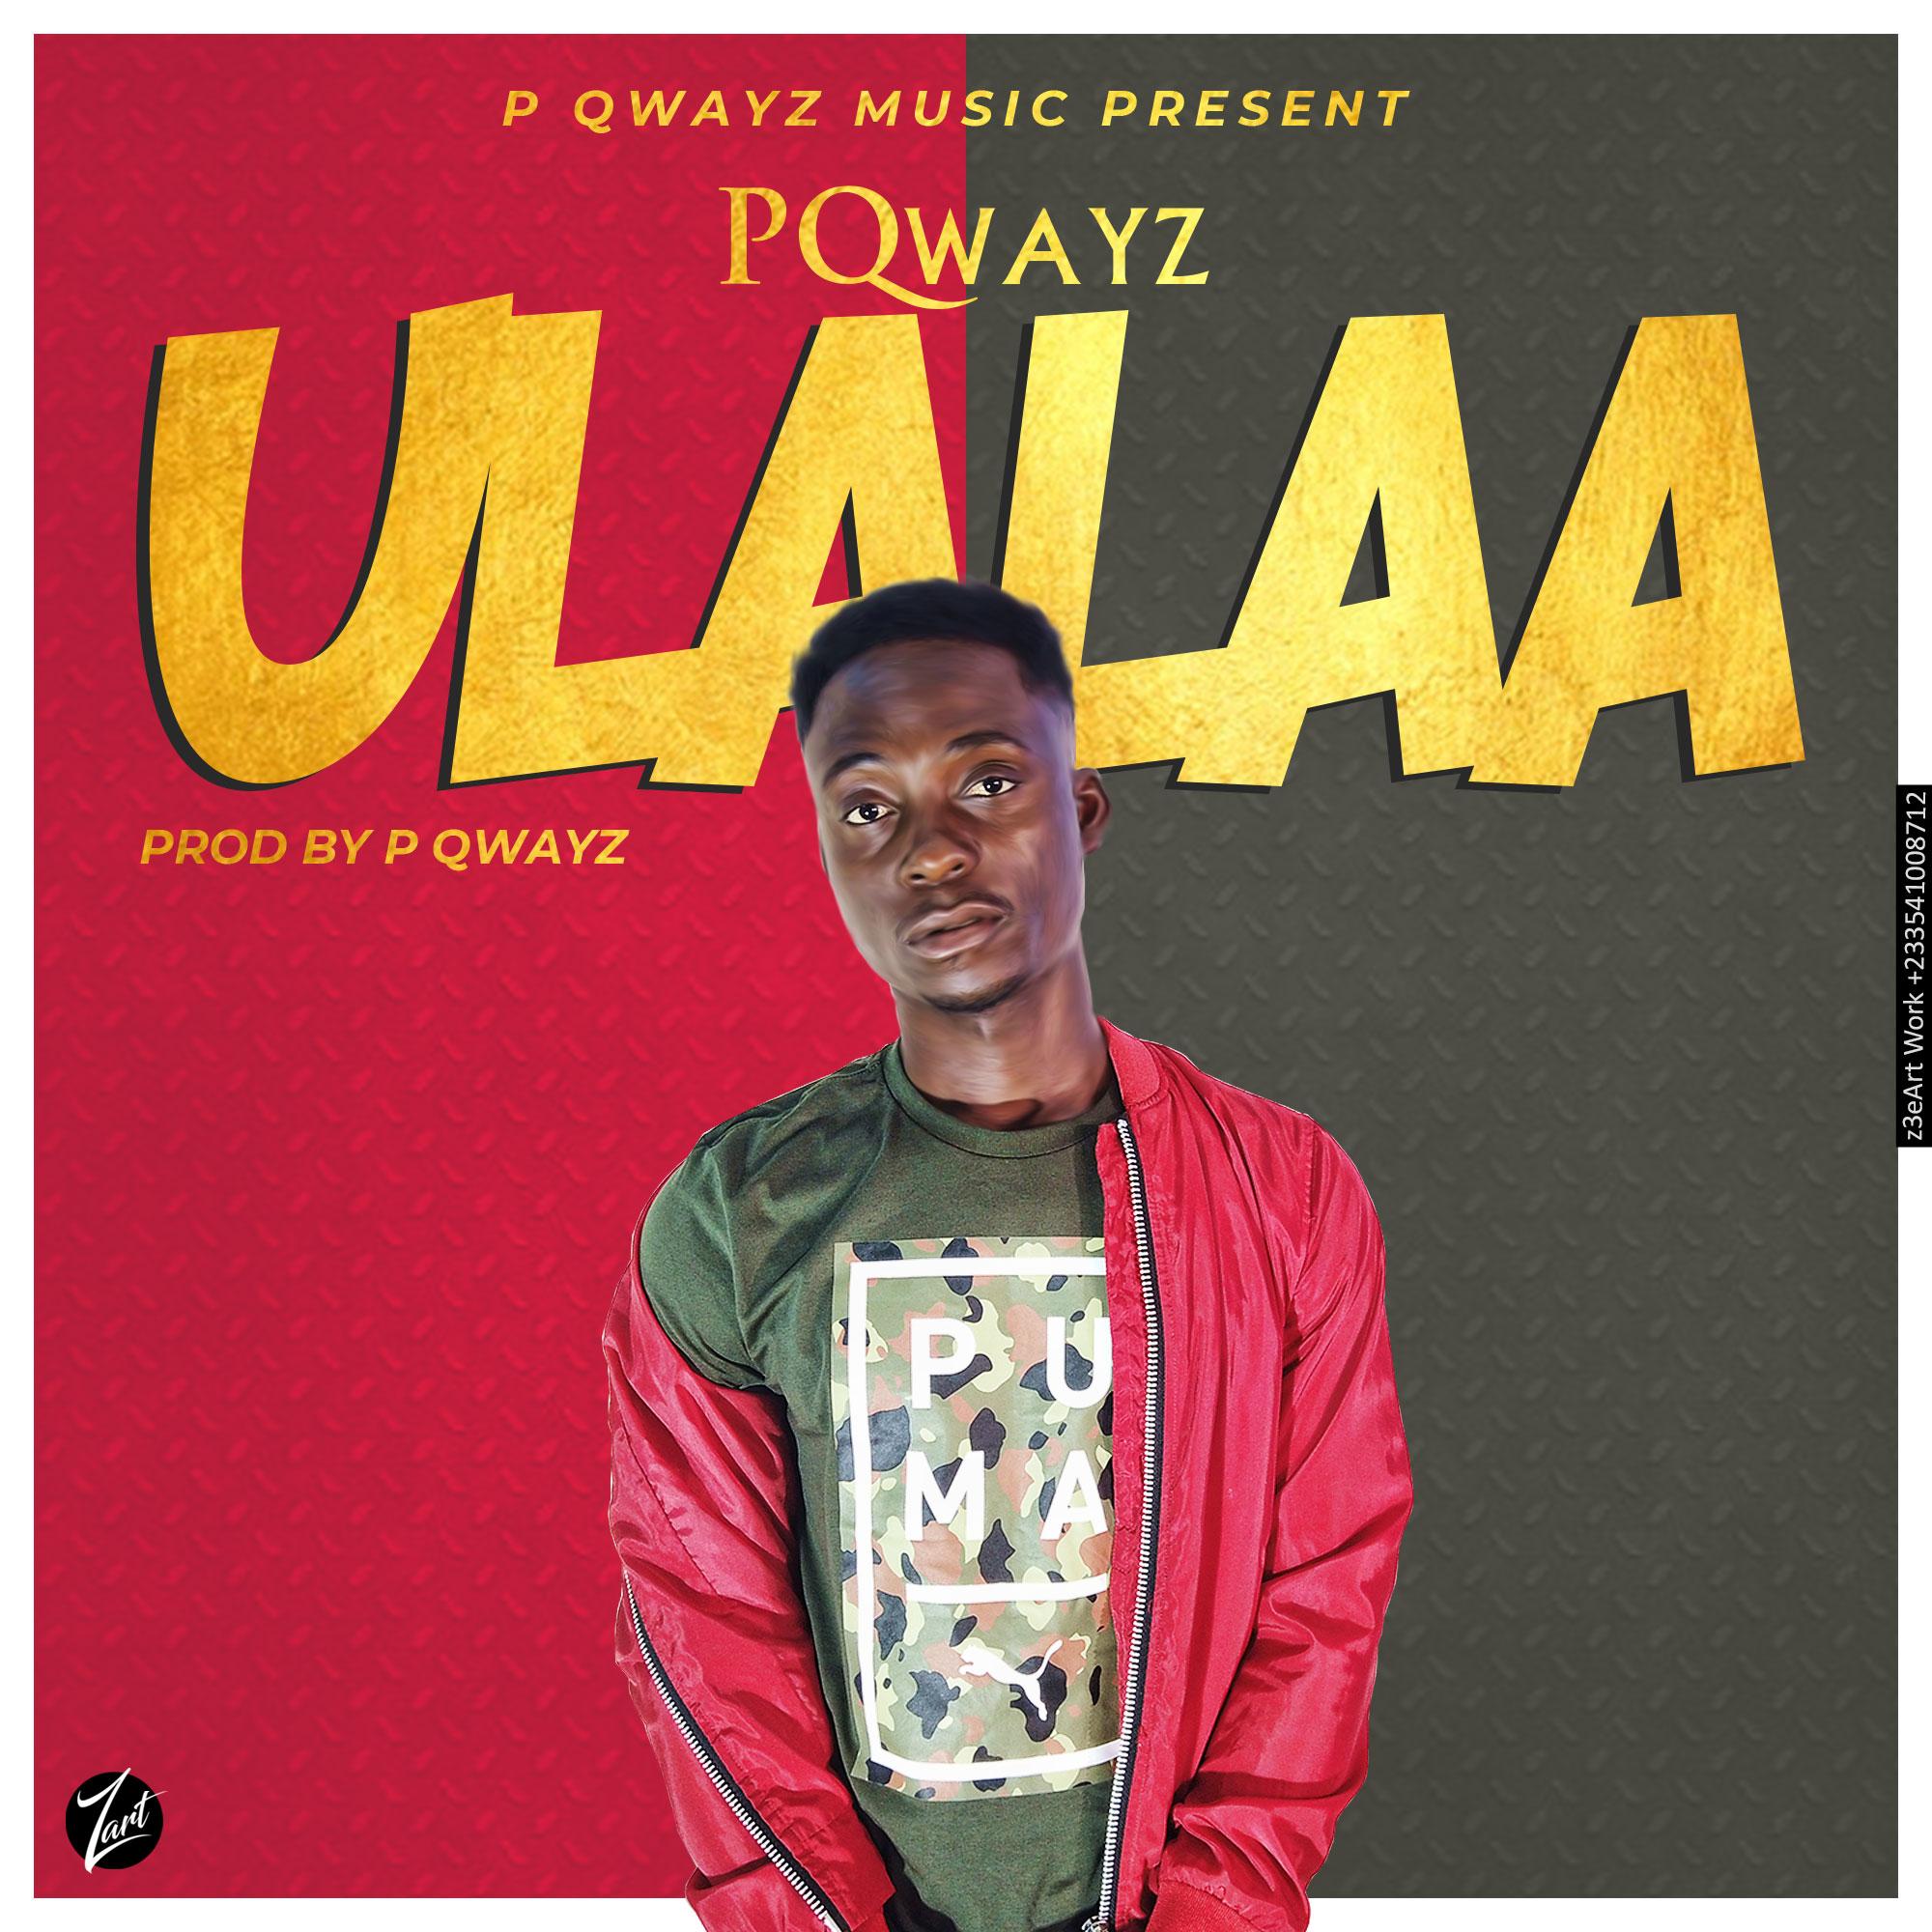 P Qwayz - Ulalaa